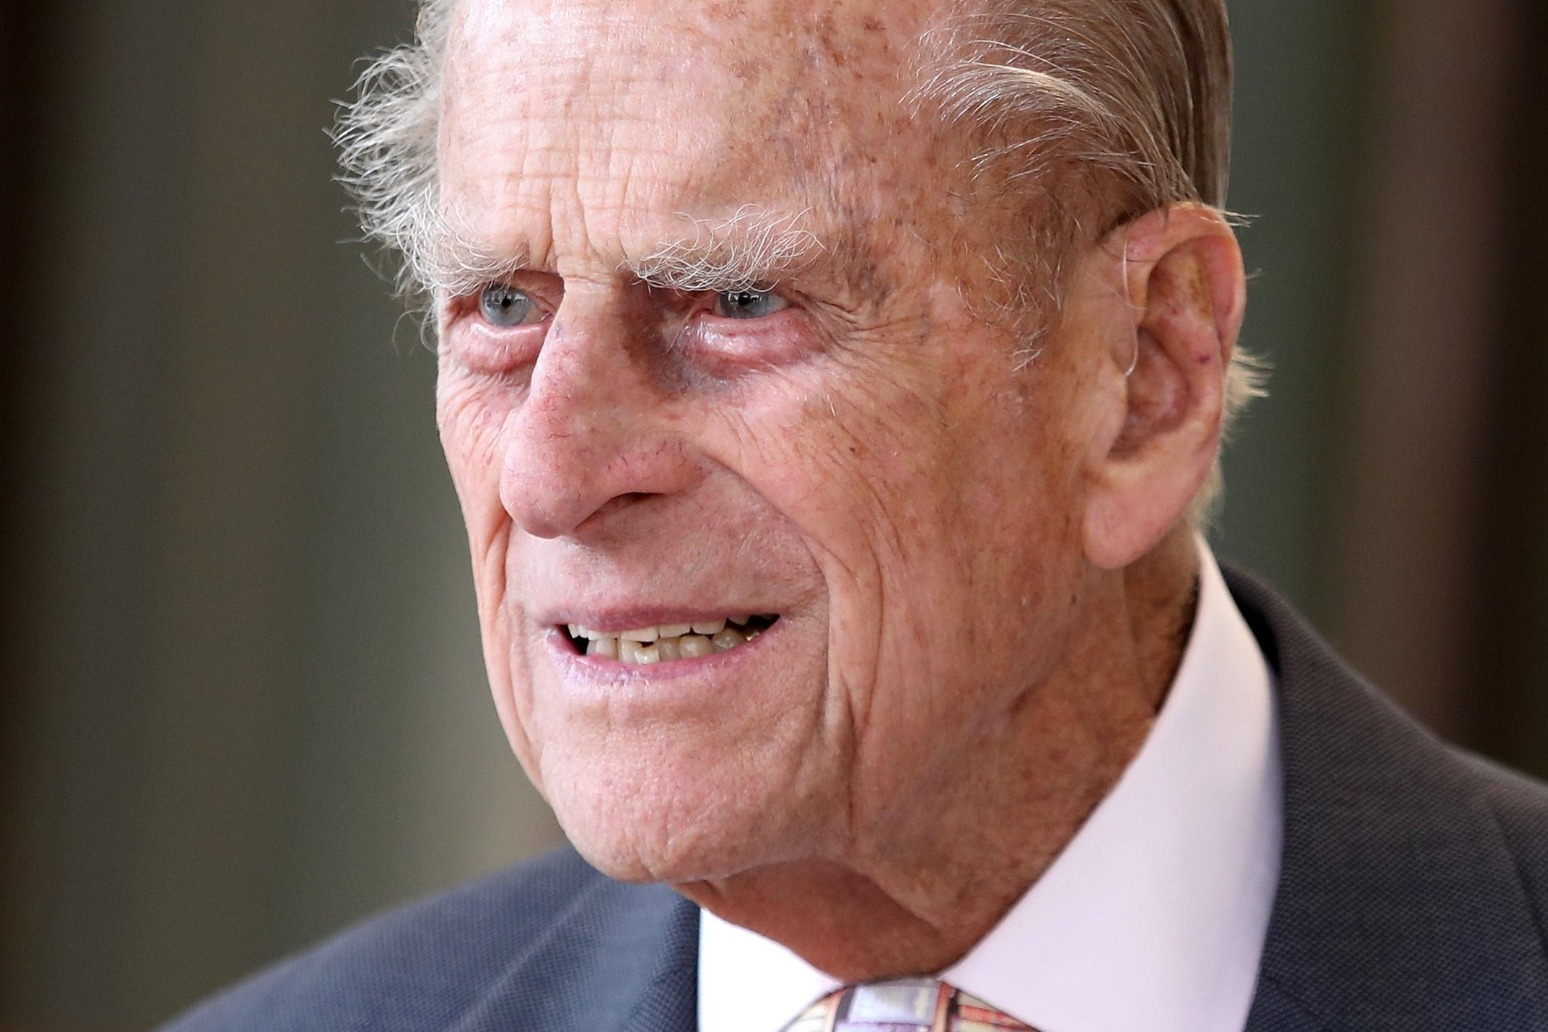 Duke of Edinburgh moved back to King Edward VII's Hospital after surgery